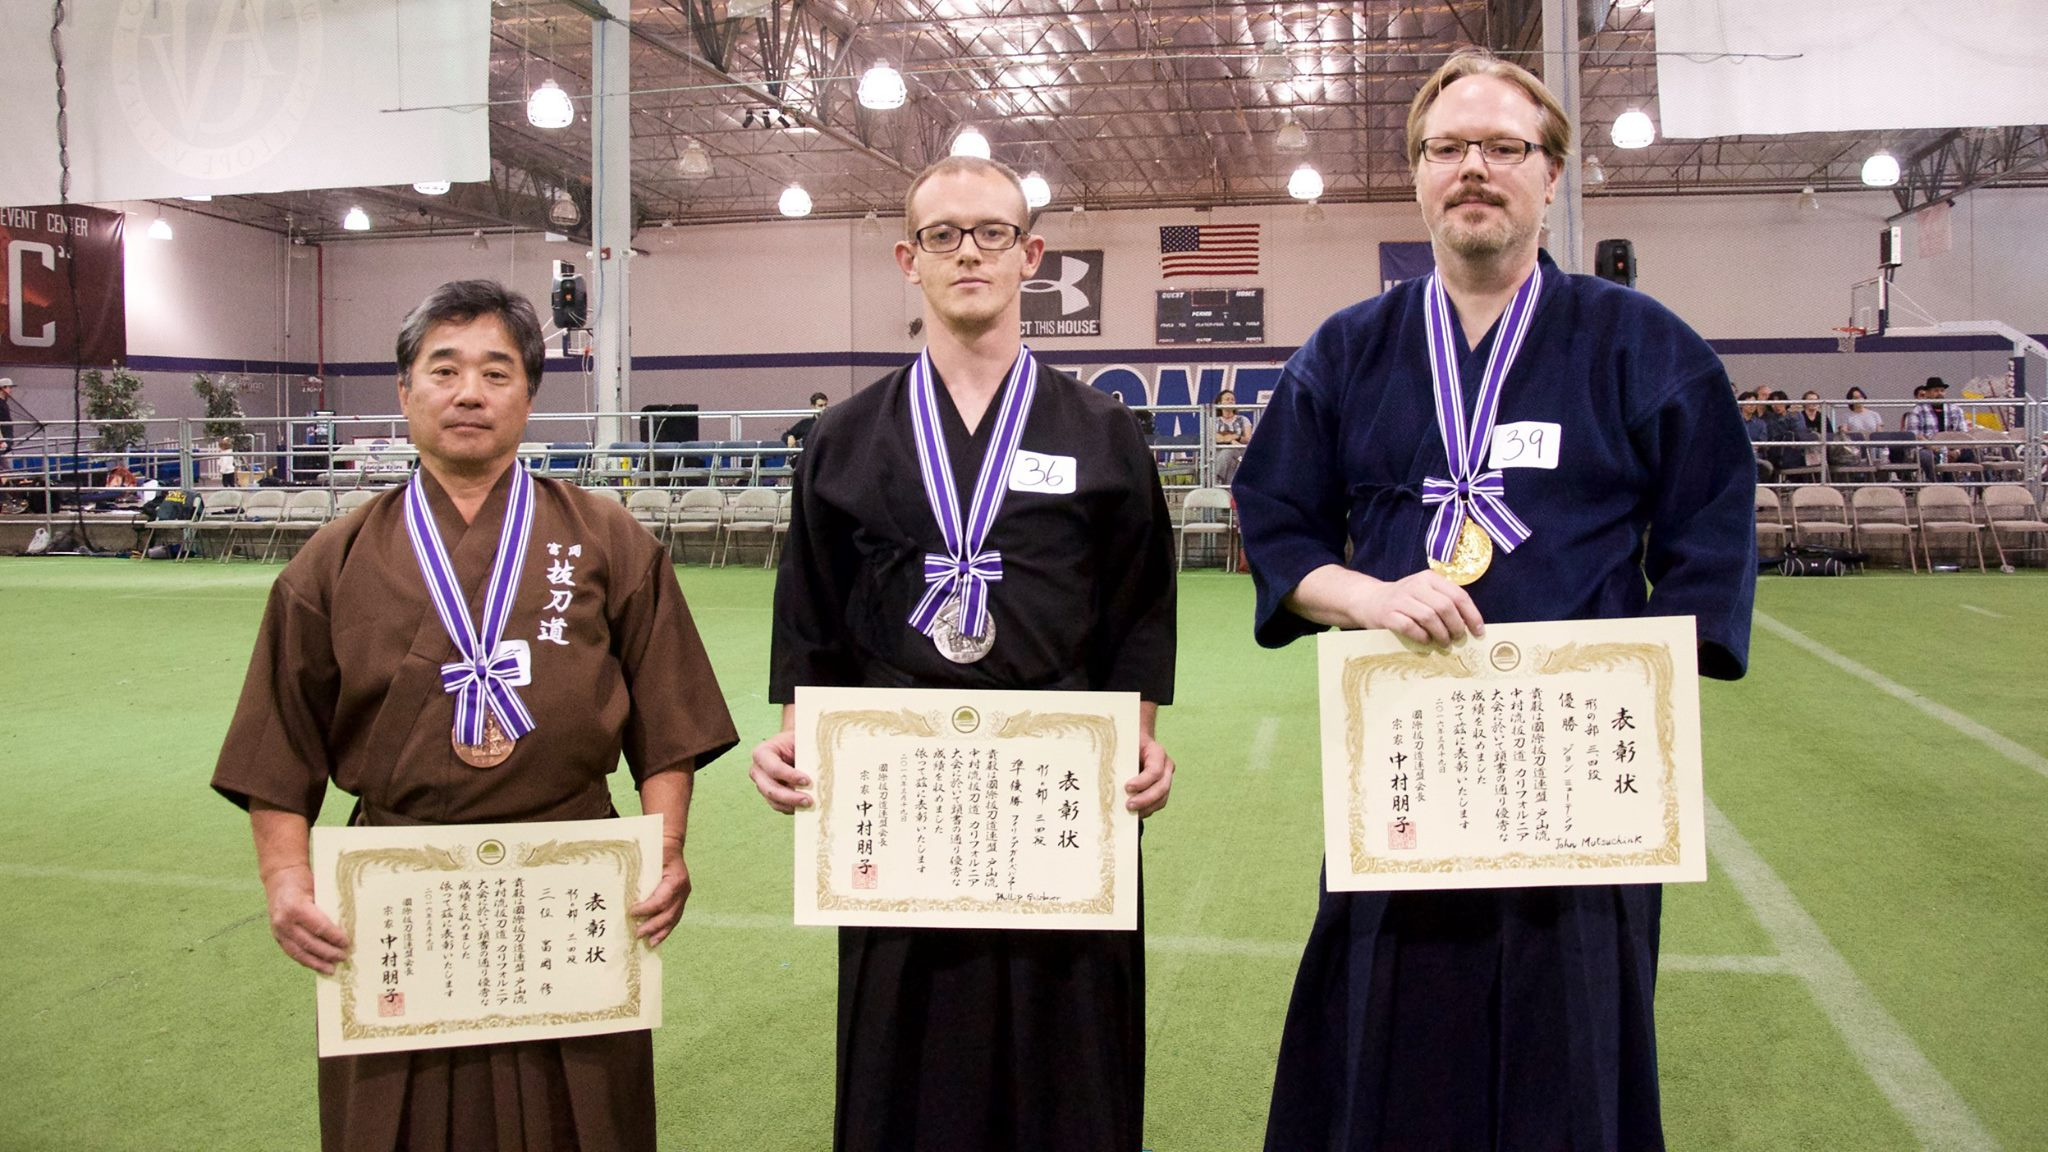 Tex - 1st place Kata - Sandan/Yondan division.